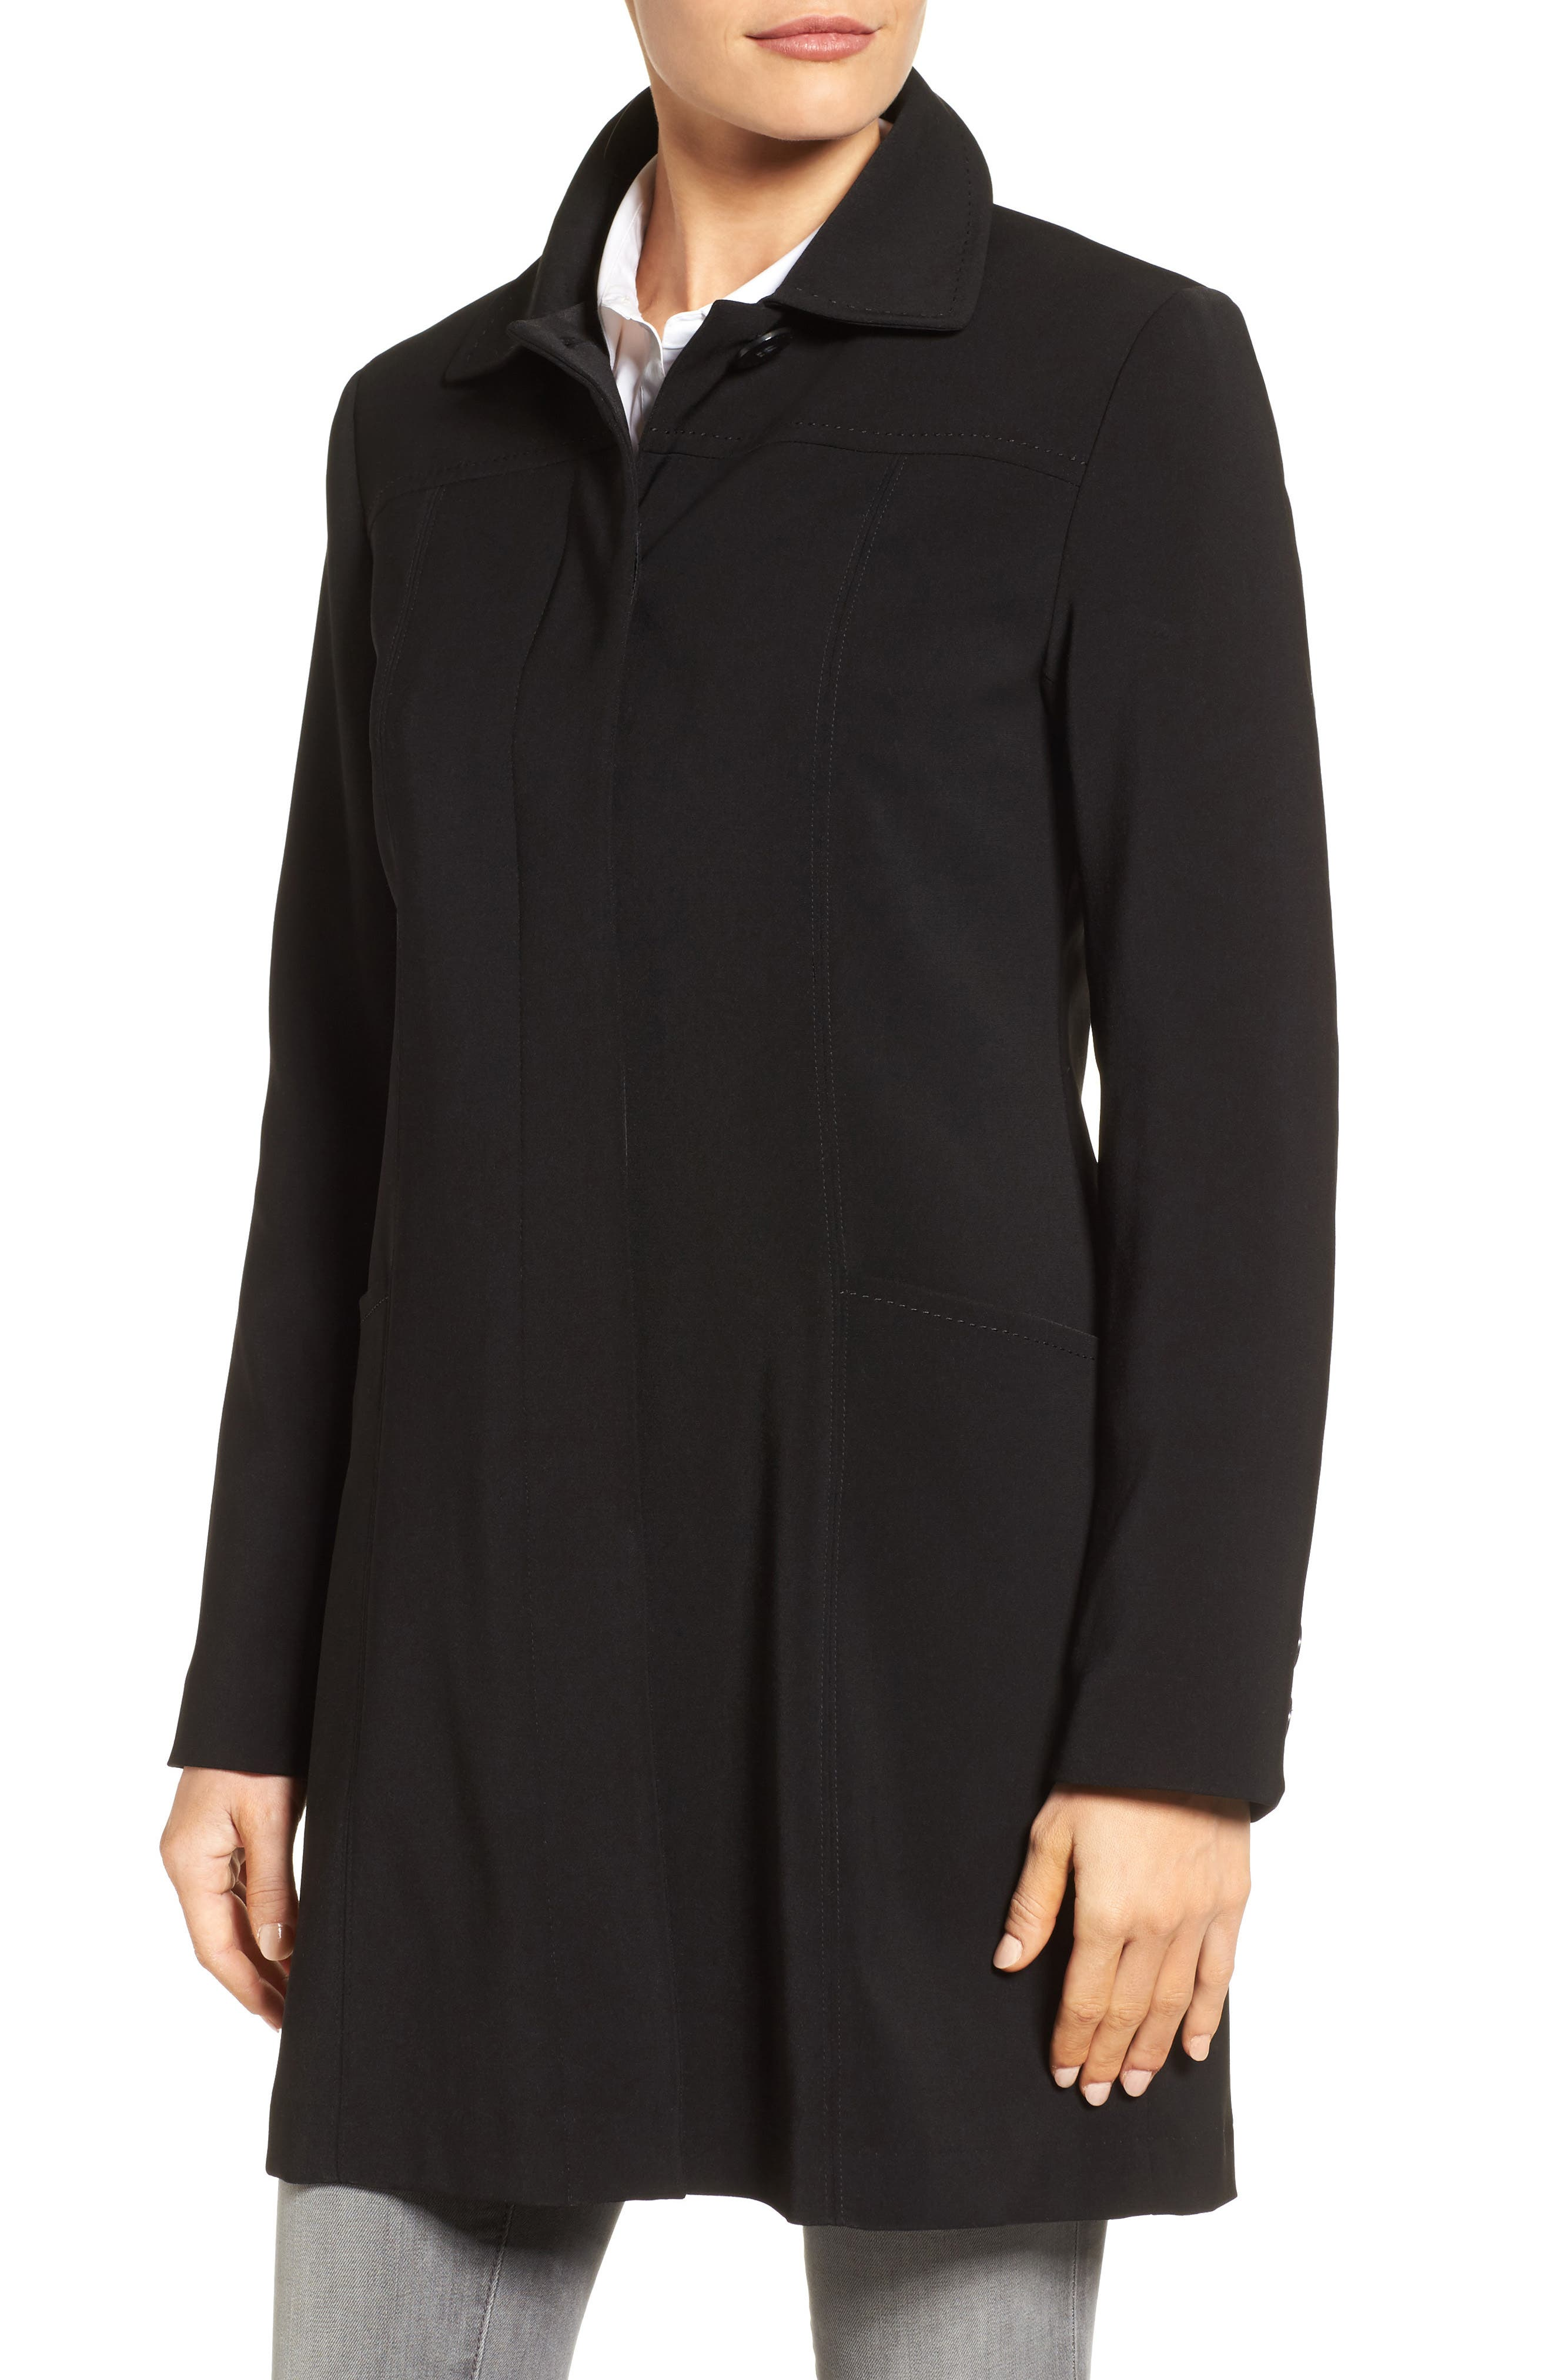 Alternate Image 4  - Gallery Pickstitch Nepage Walking Coat with Detachable Hood (Regular & Petite)